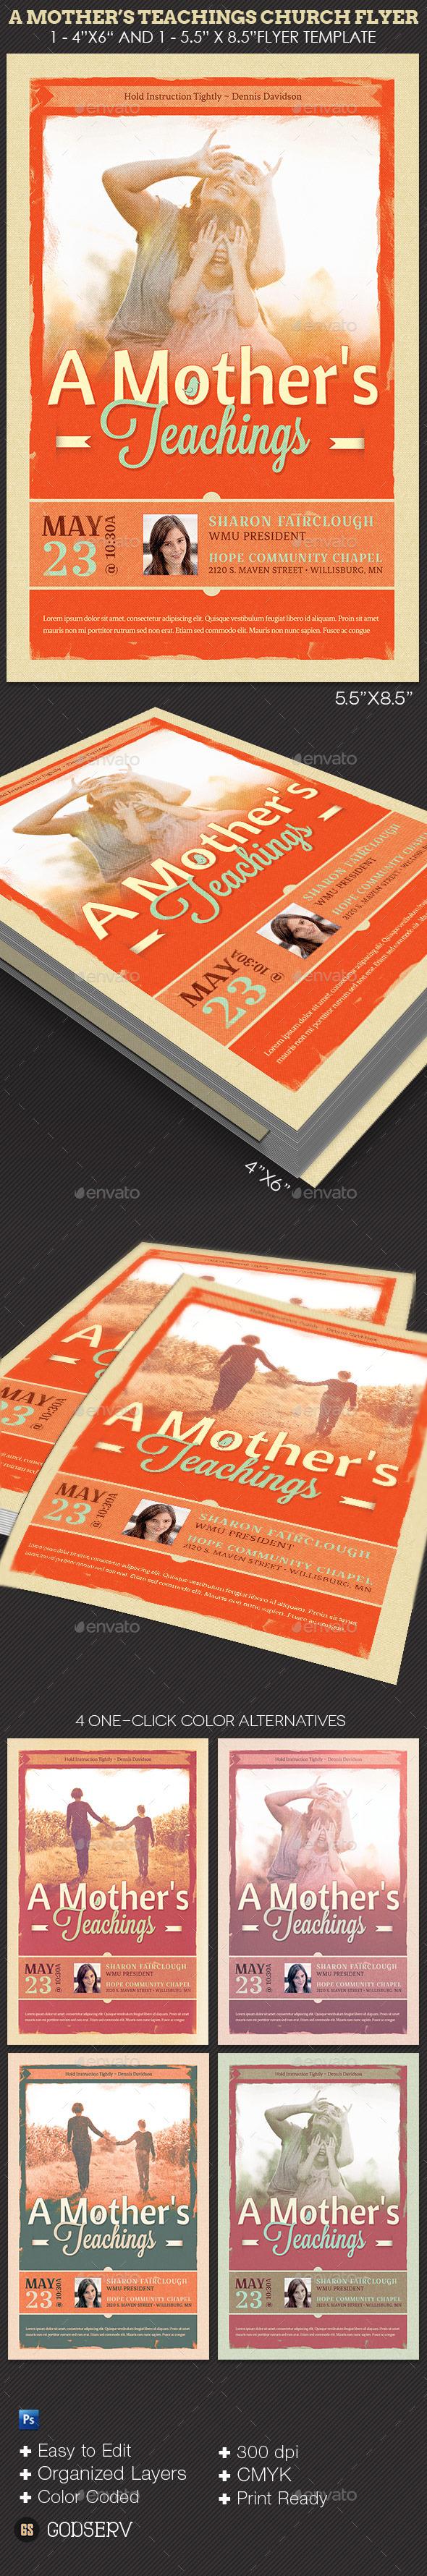 Mothers Teachings Church Flyer Template - Church Flyers